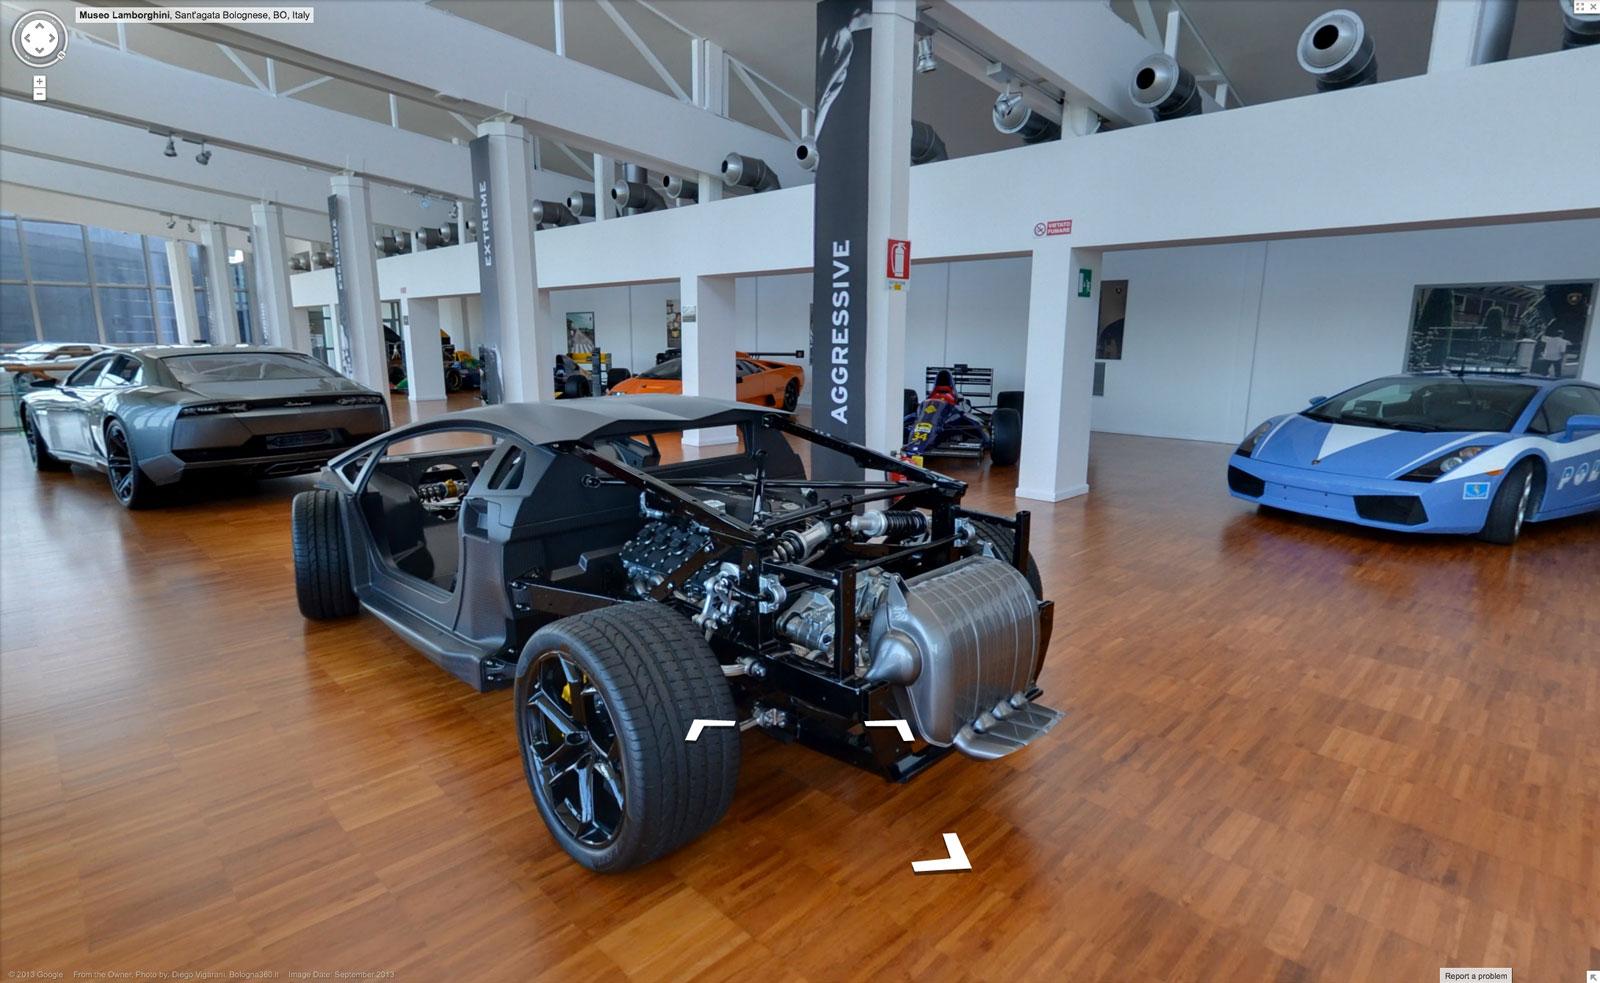 lamborghini museum virtual tour - car body design